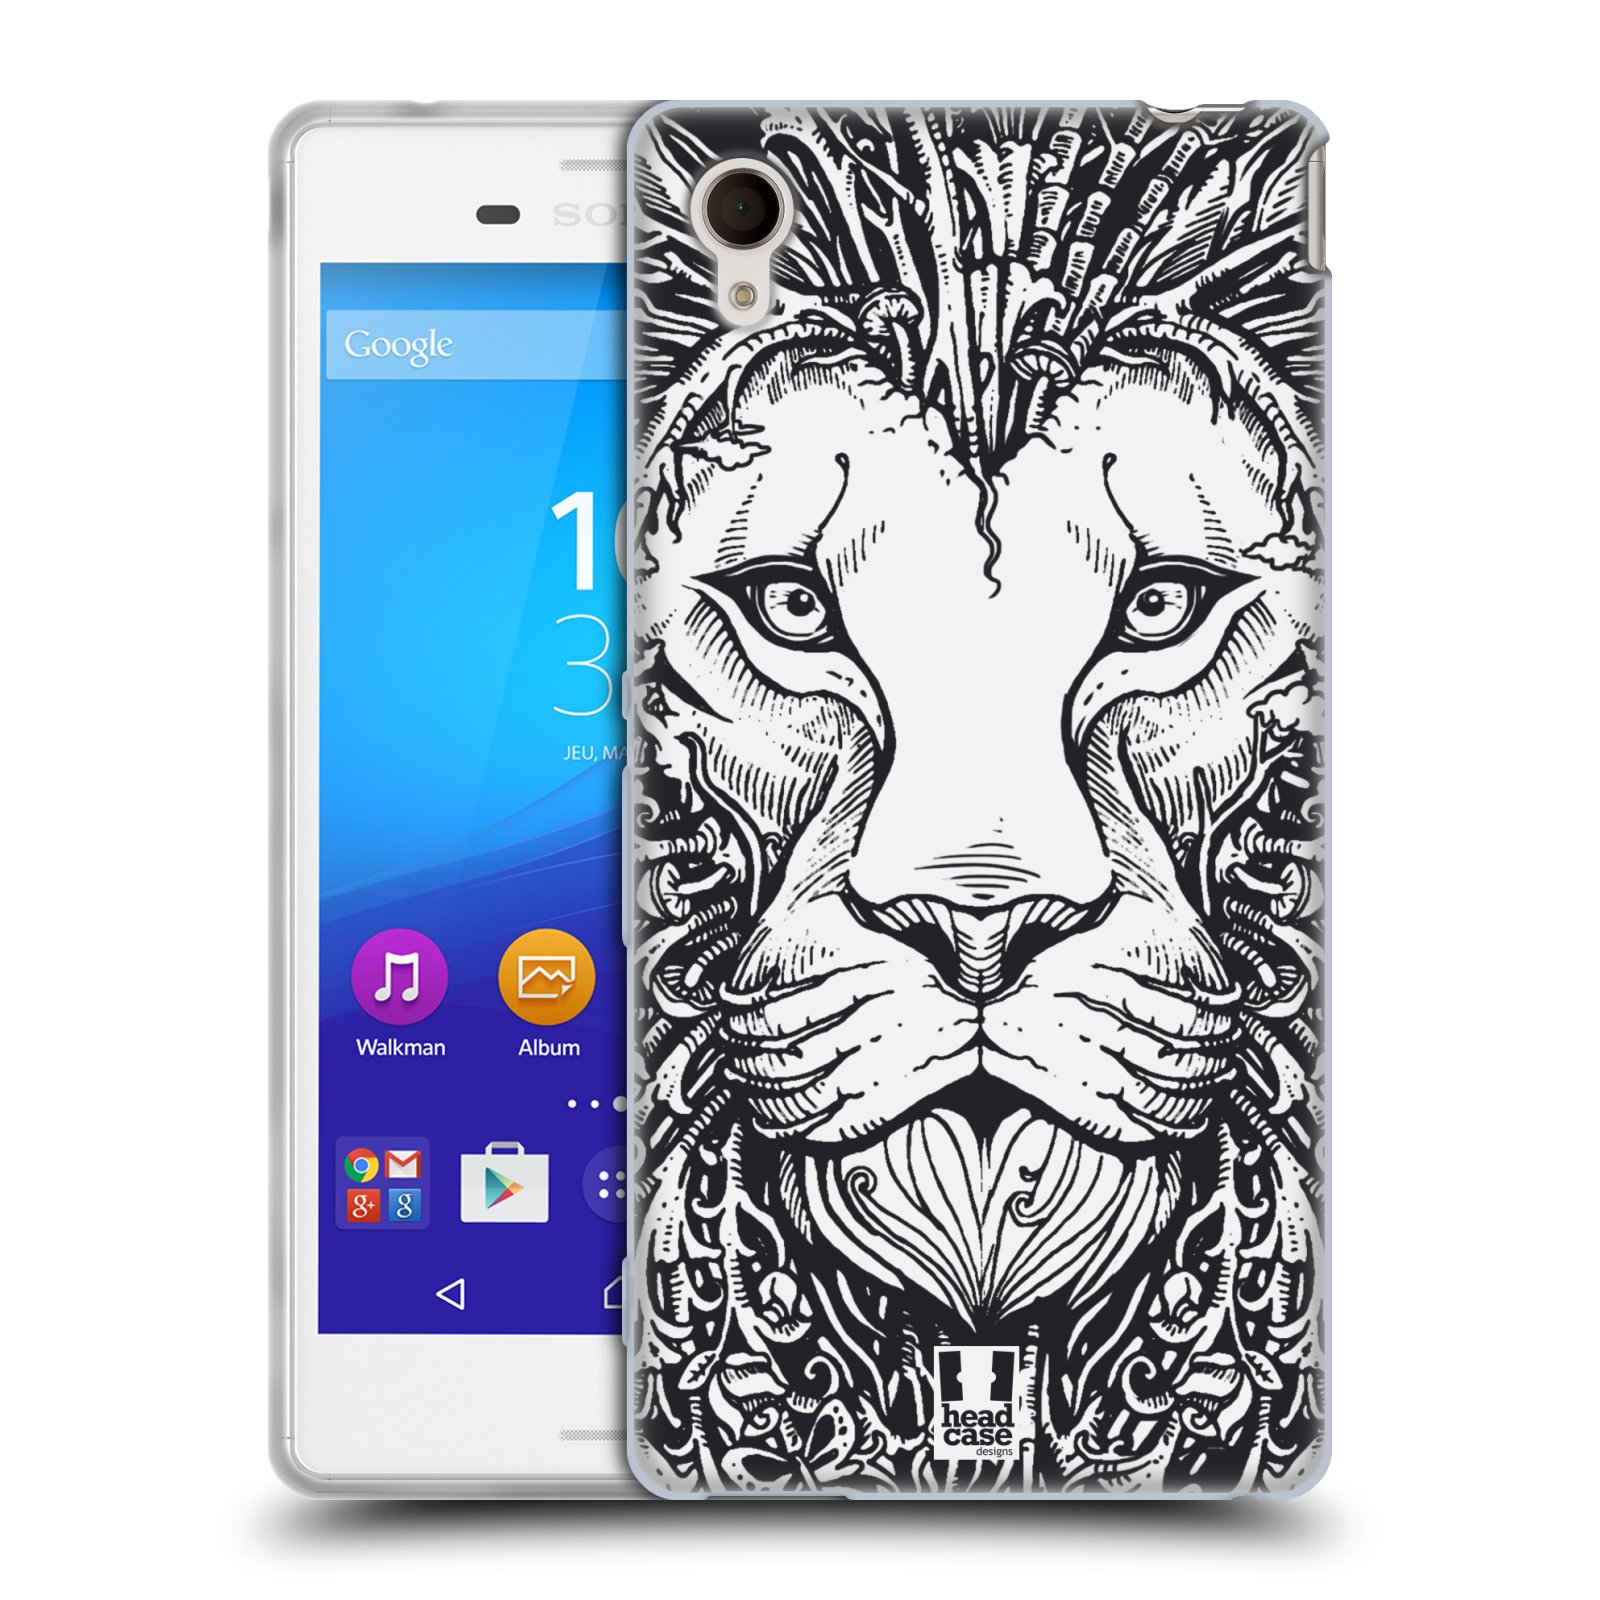 Silikonové pouzdro na mobil Sony Xperia M4 Aqua E2303 HEAD CASE DOODLE TVÁŘ LEV (Silikonový kryt či obal na mobilní telefon Sony Xperia M4 Aqua a M4 Aqua Dual SIM)